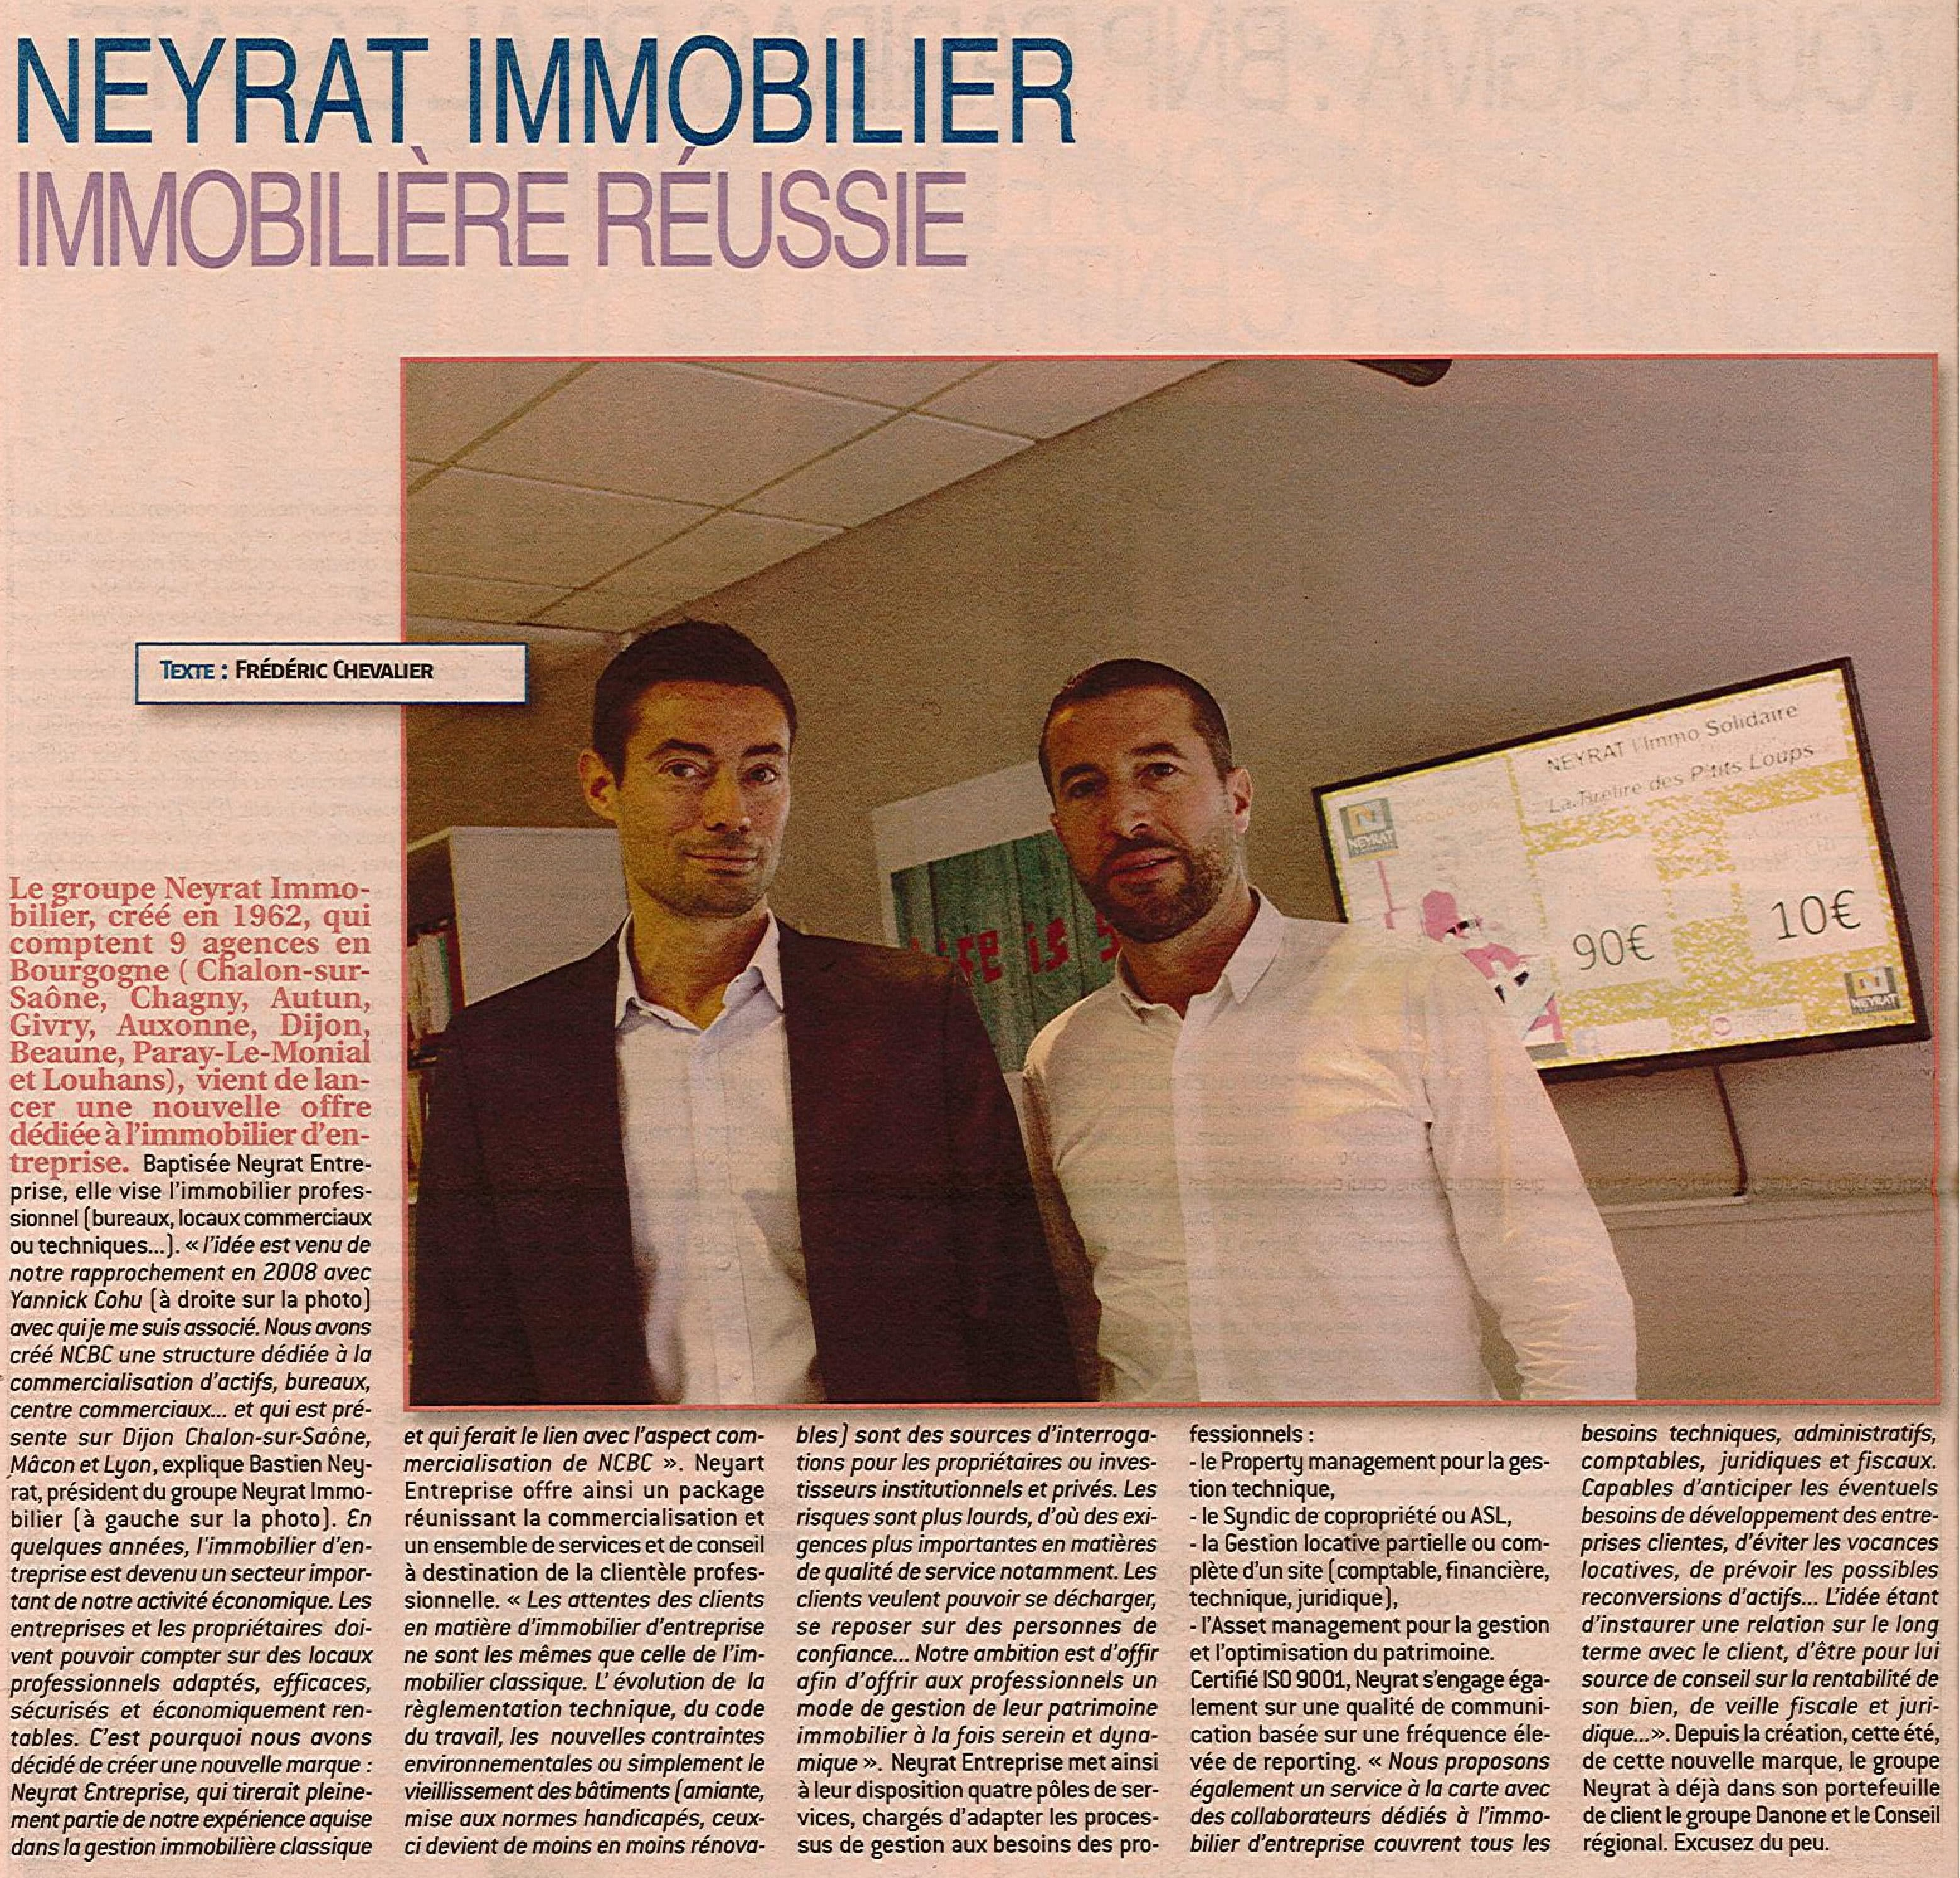 NEYRAT Entreprise